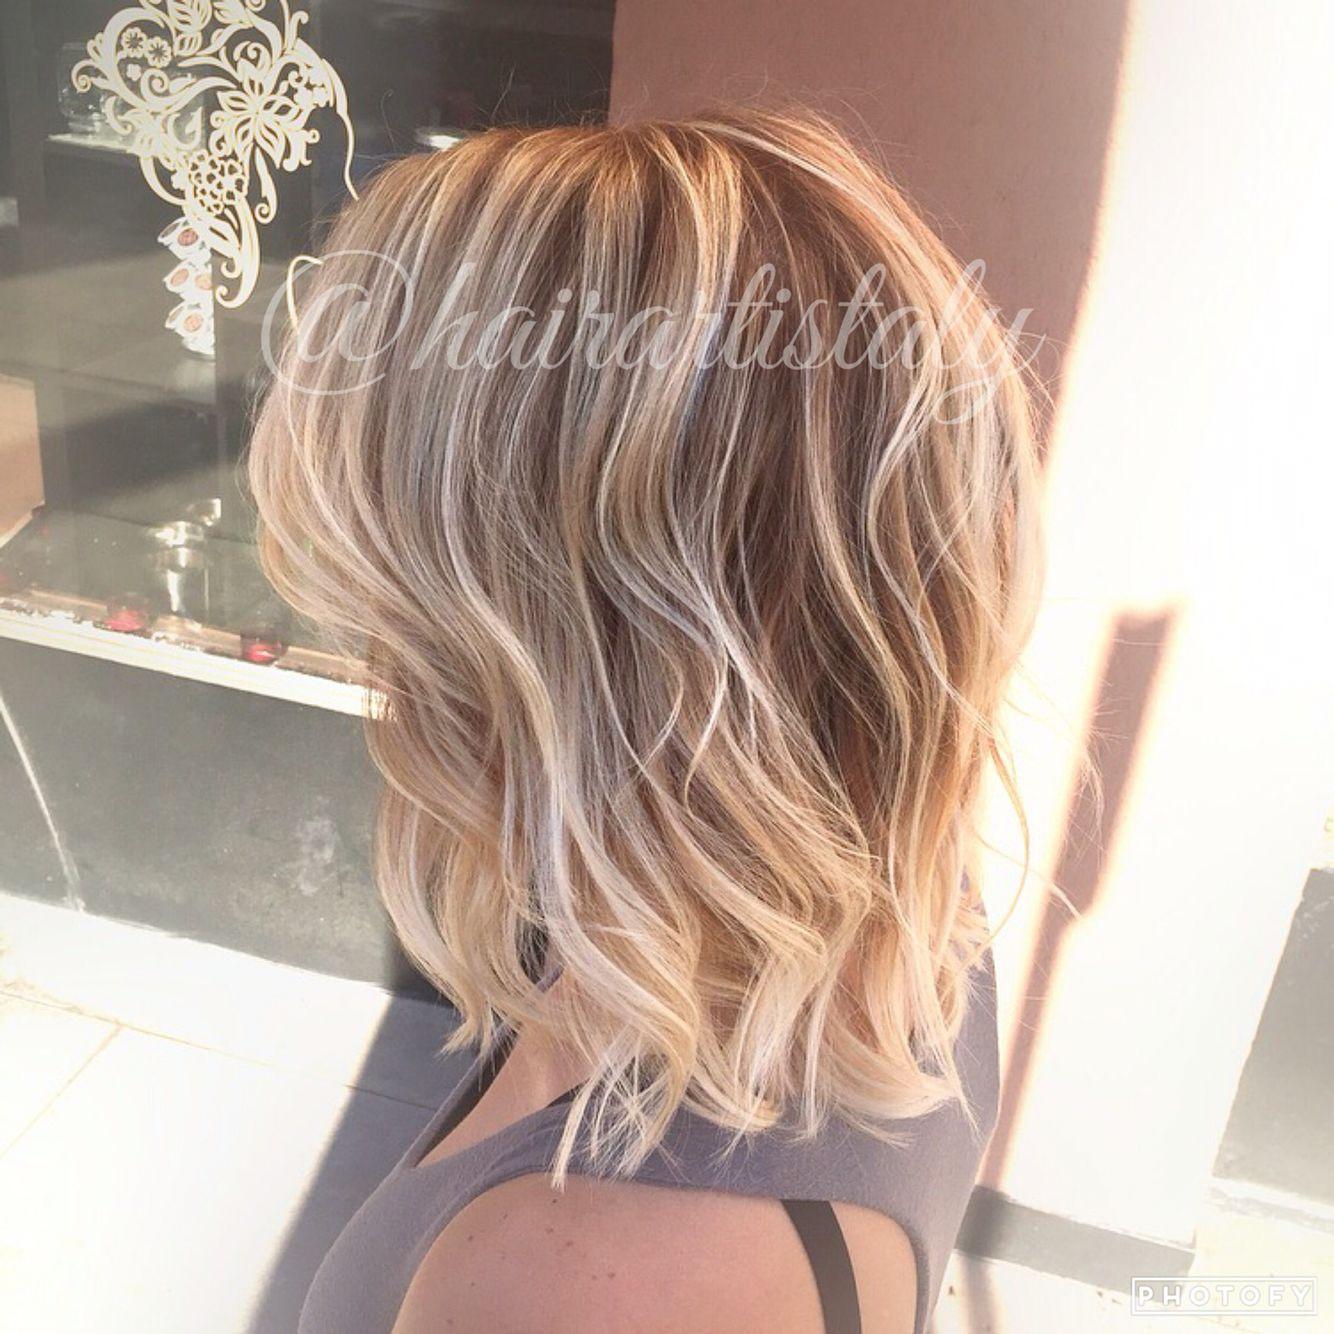 Bright Blonde Balayage Lob Haircut Hair By Aly Tompkins Mon Amie